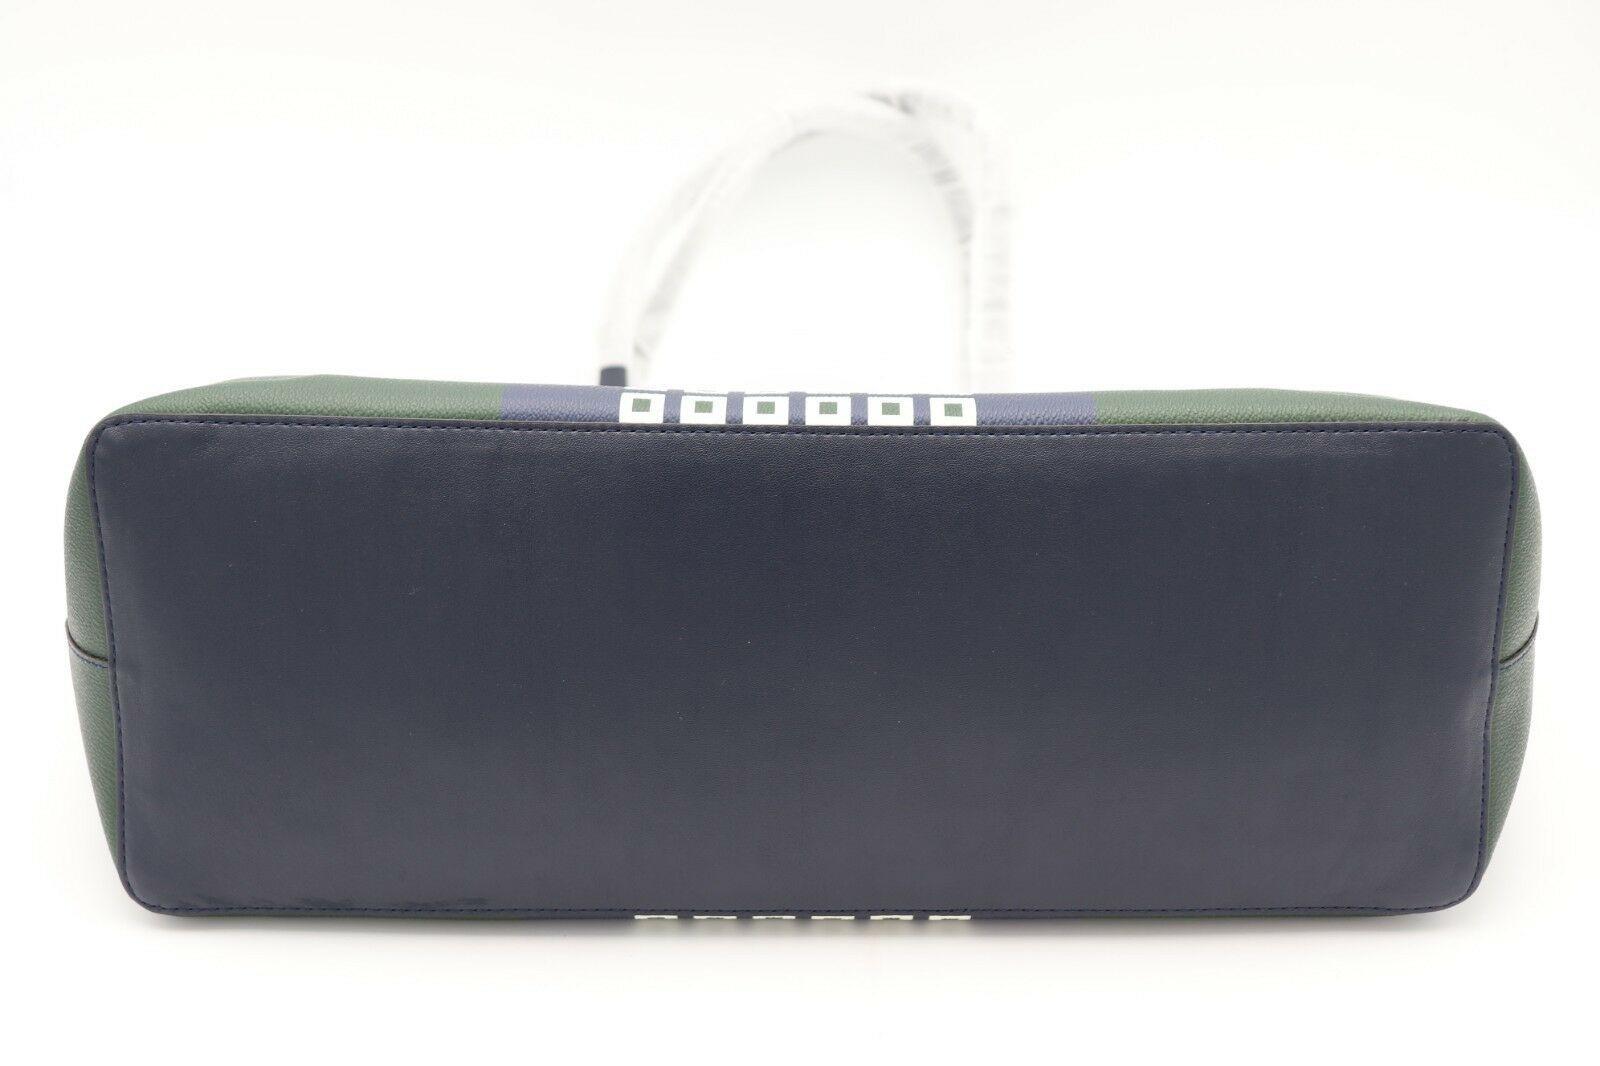 NWT Tory Burch Kerrington Square Tote Green Milano Shoulder Bag New  $298 image 6